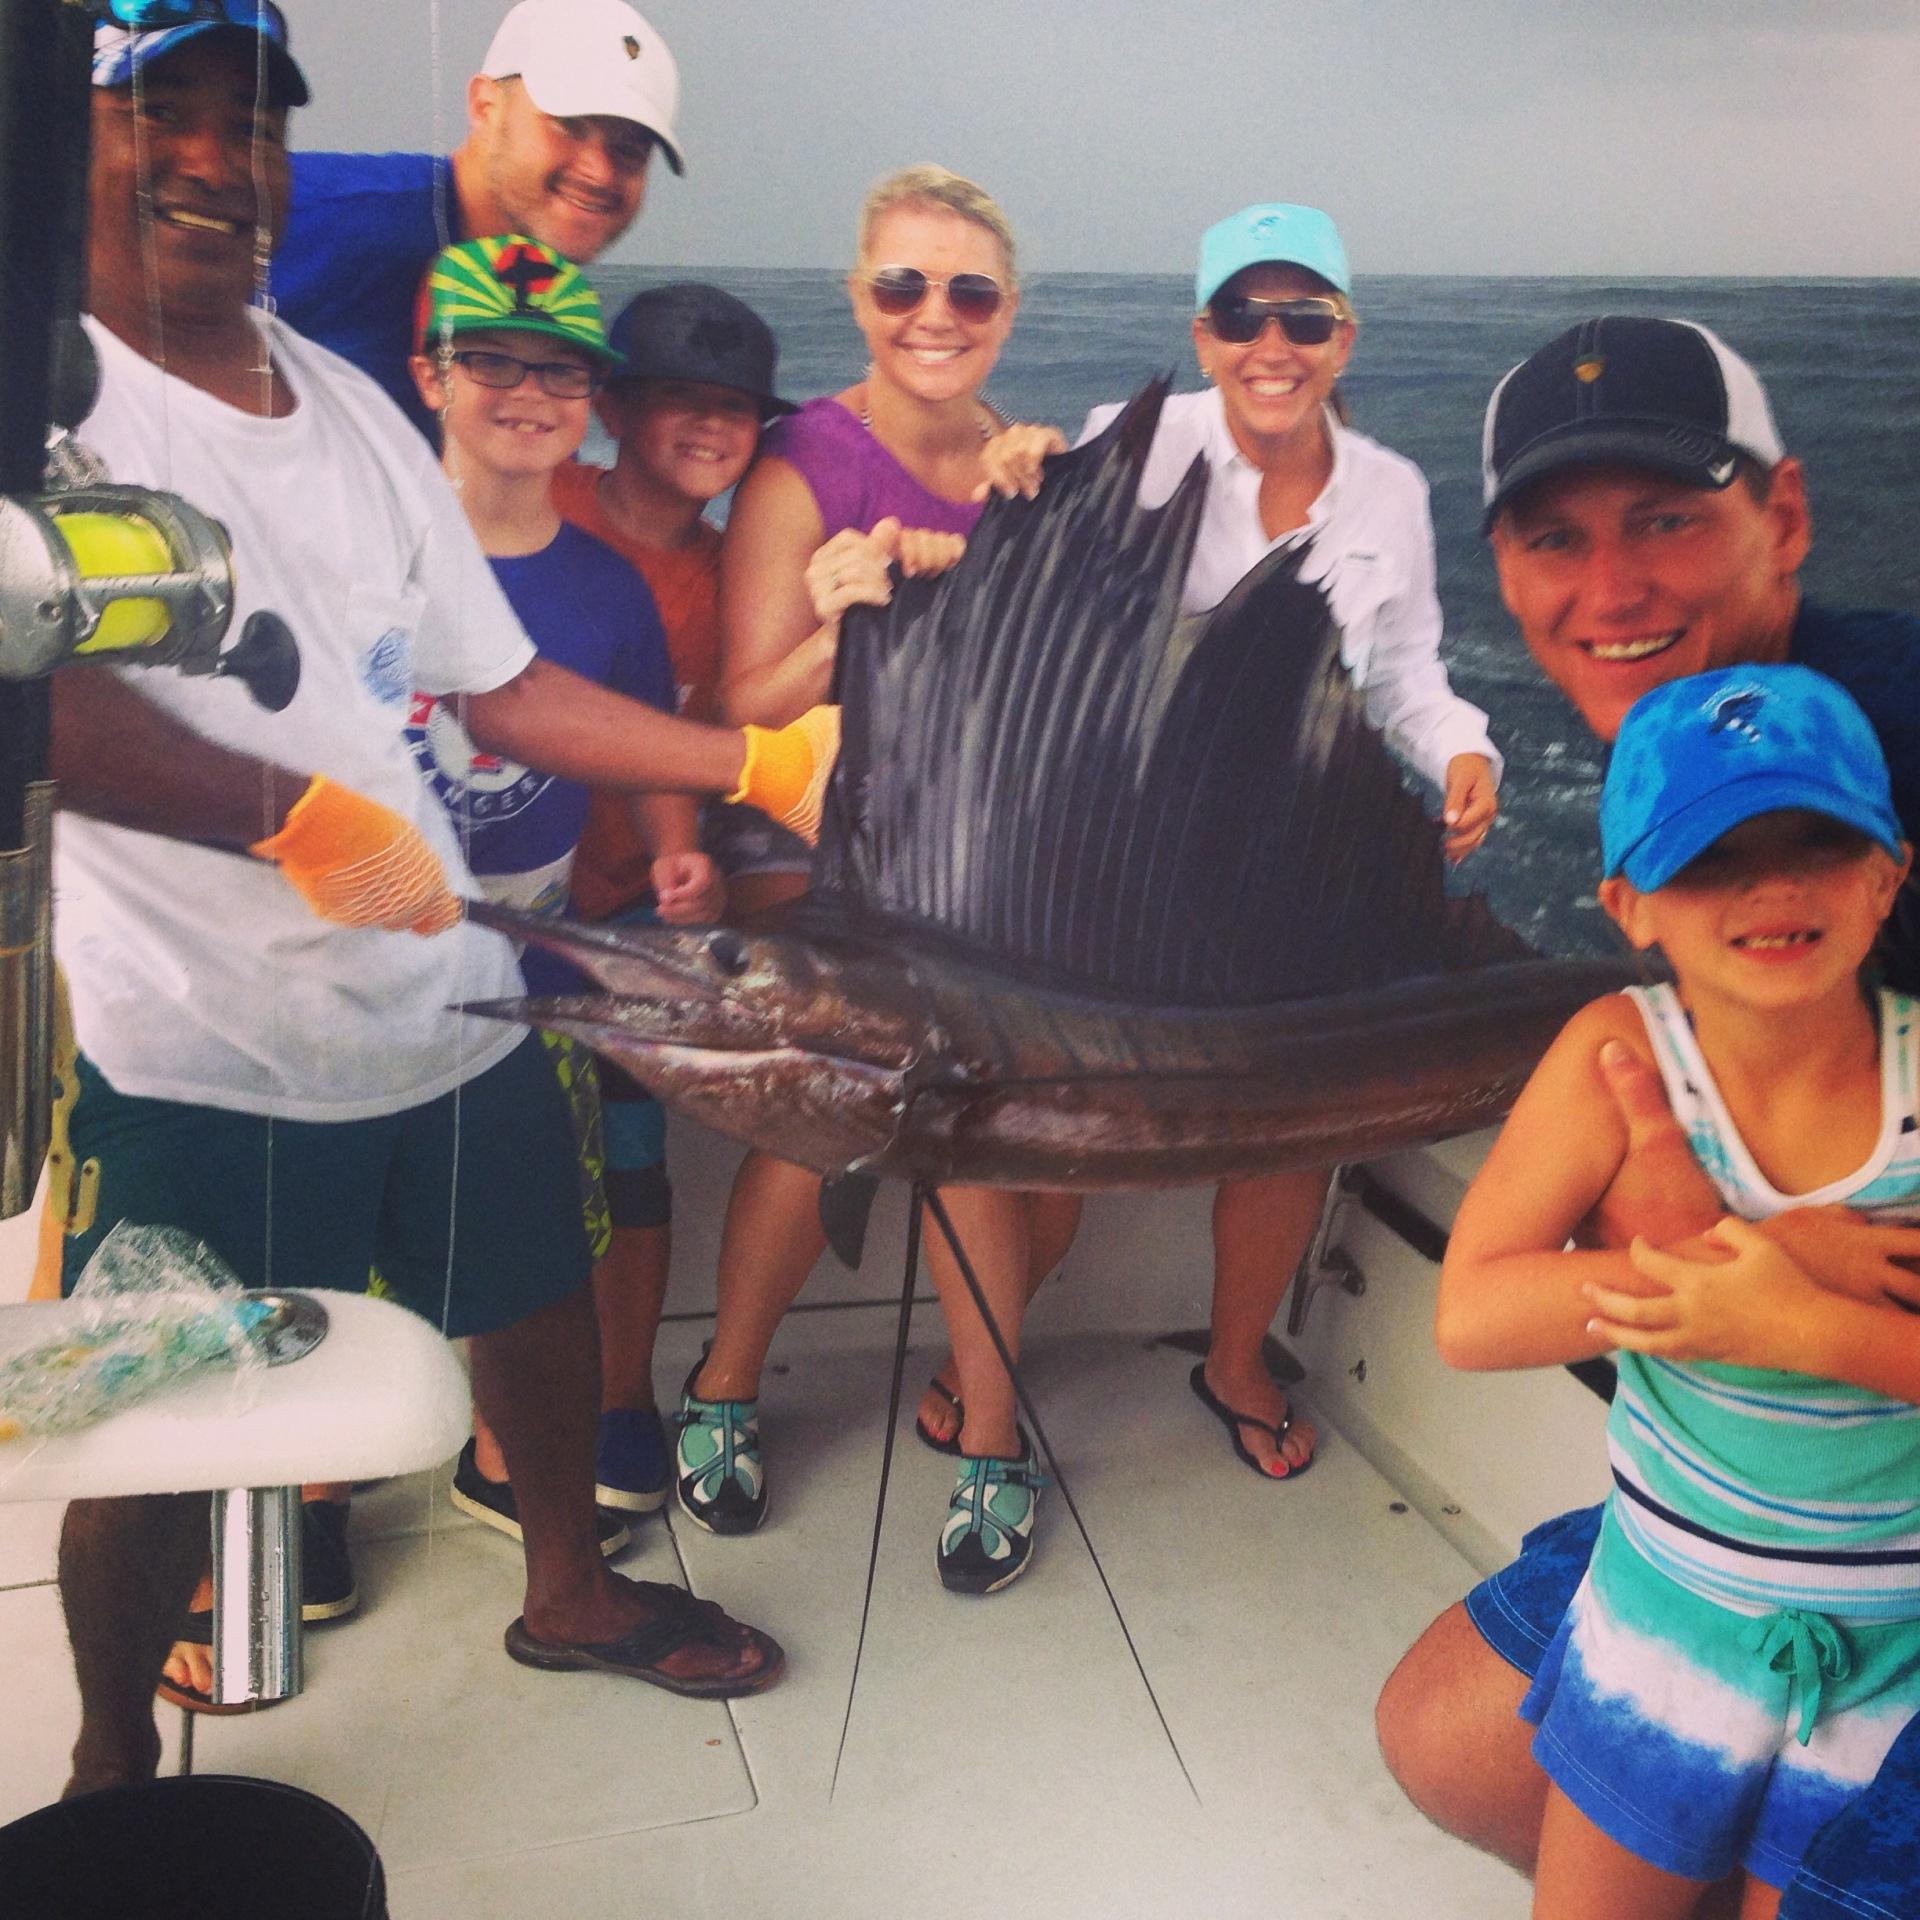 Deep sea fishing and we got lucky.